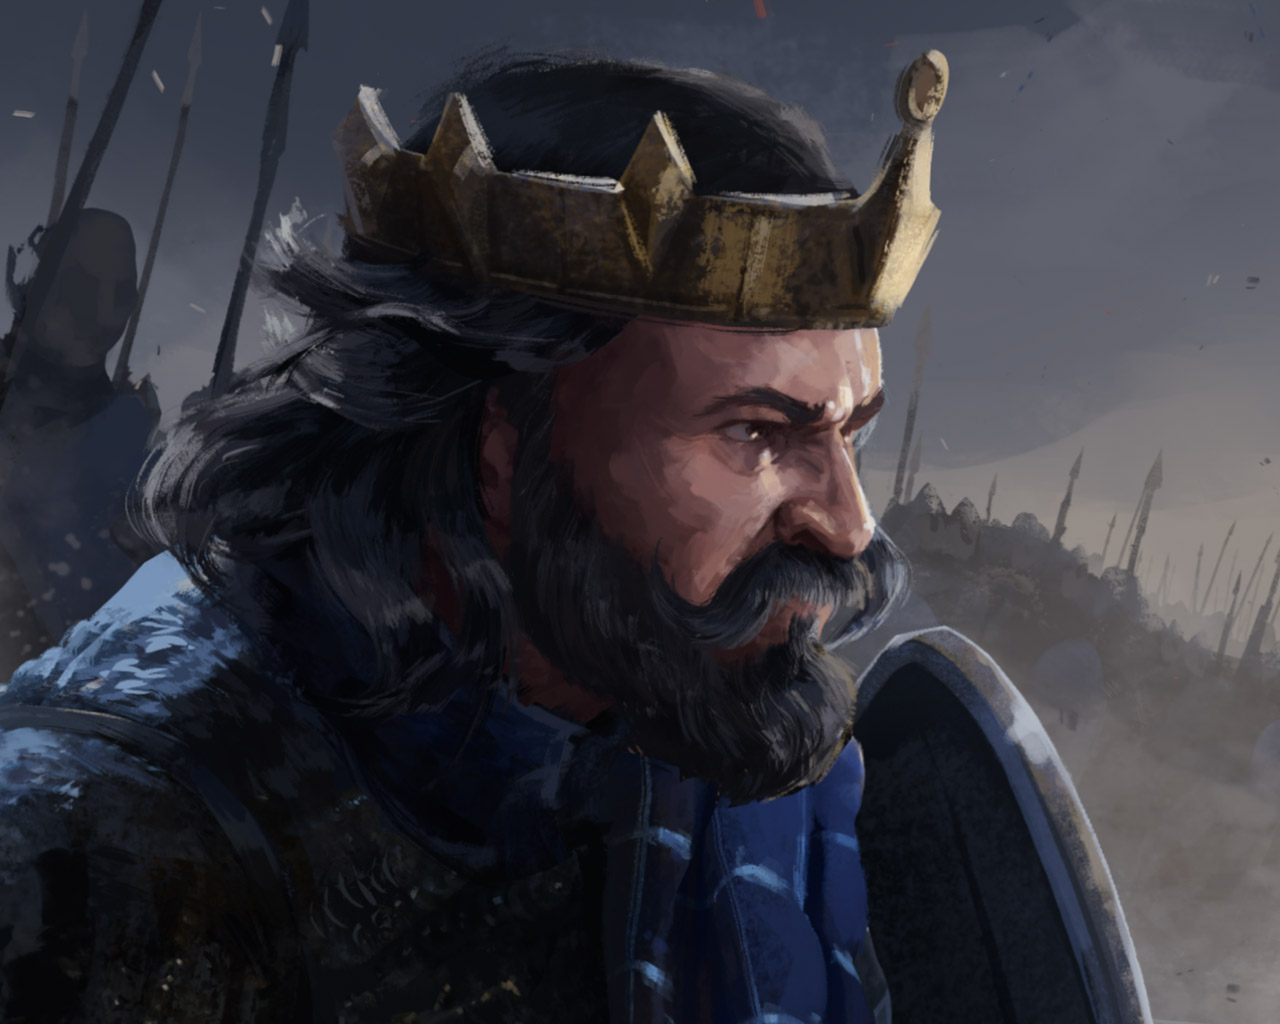 Free Total War Saga: Thrones of Britannia Wallpaper in 1280x1024